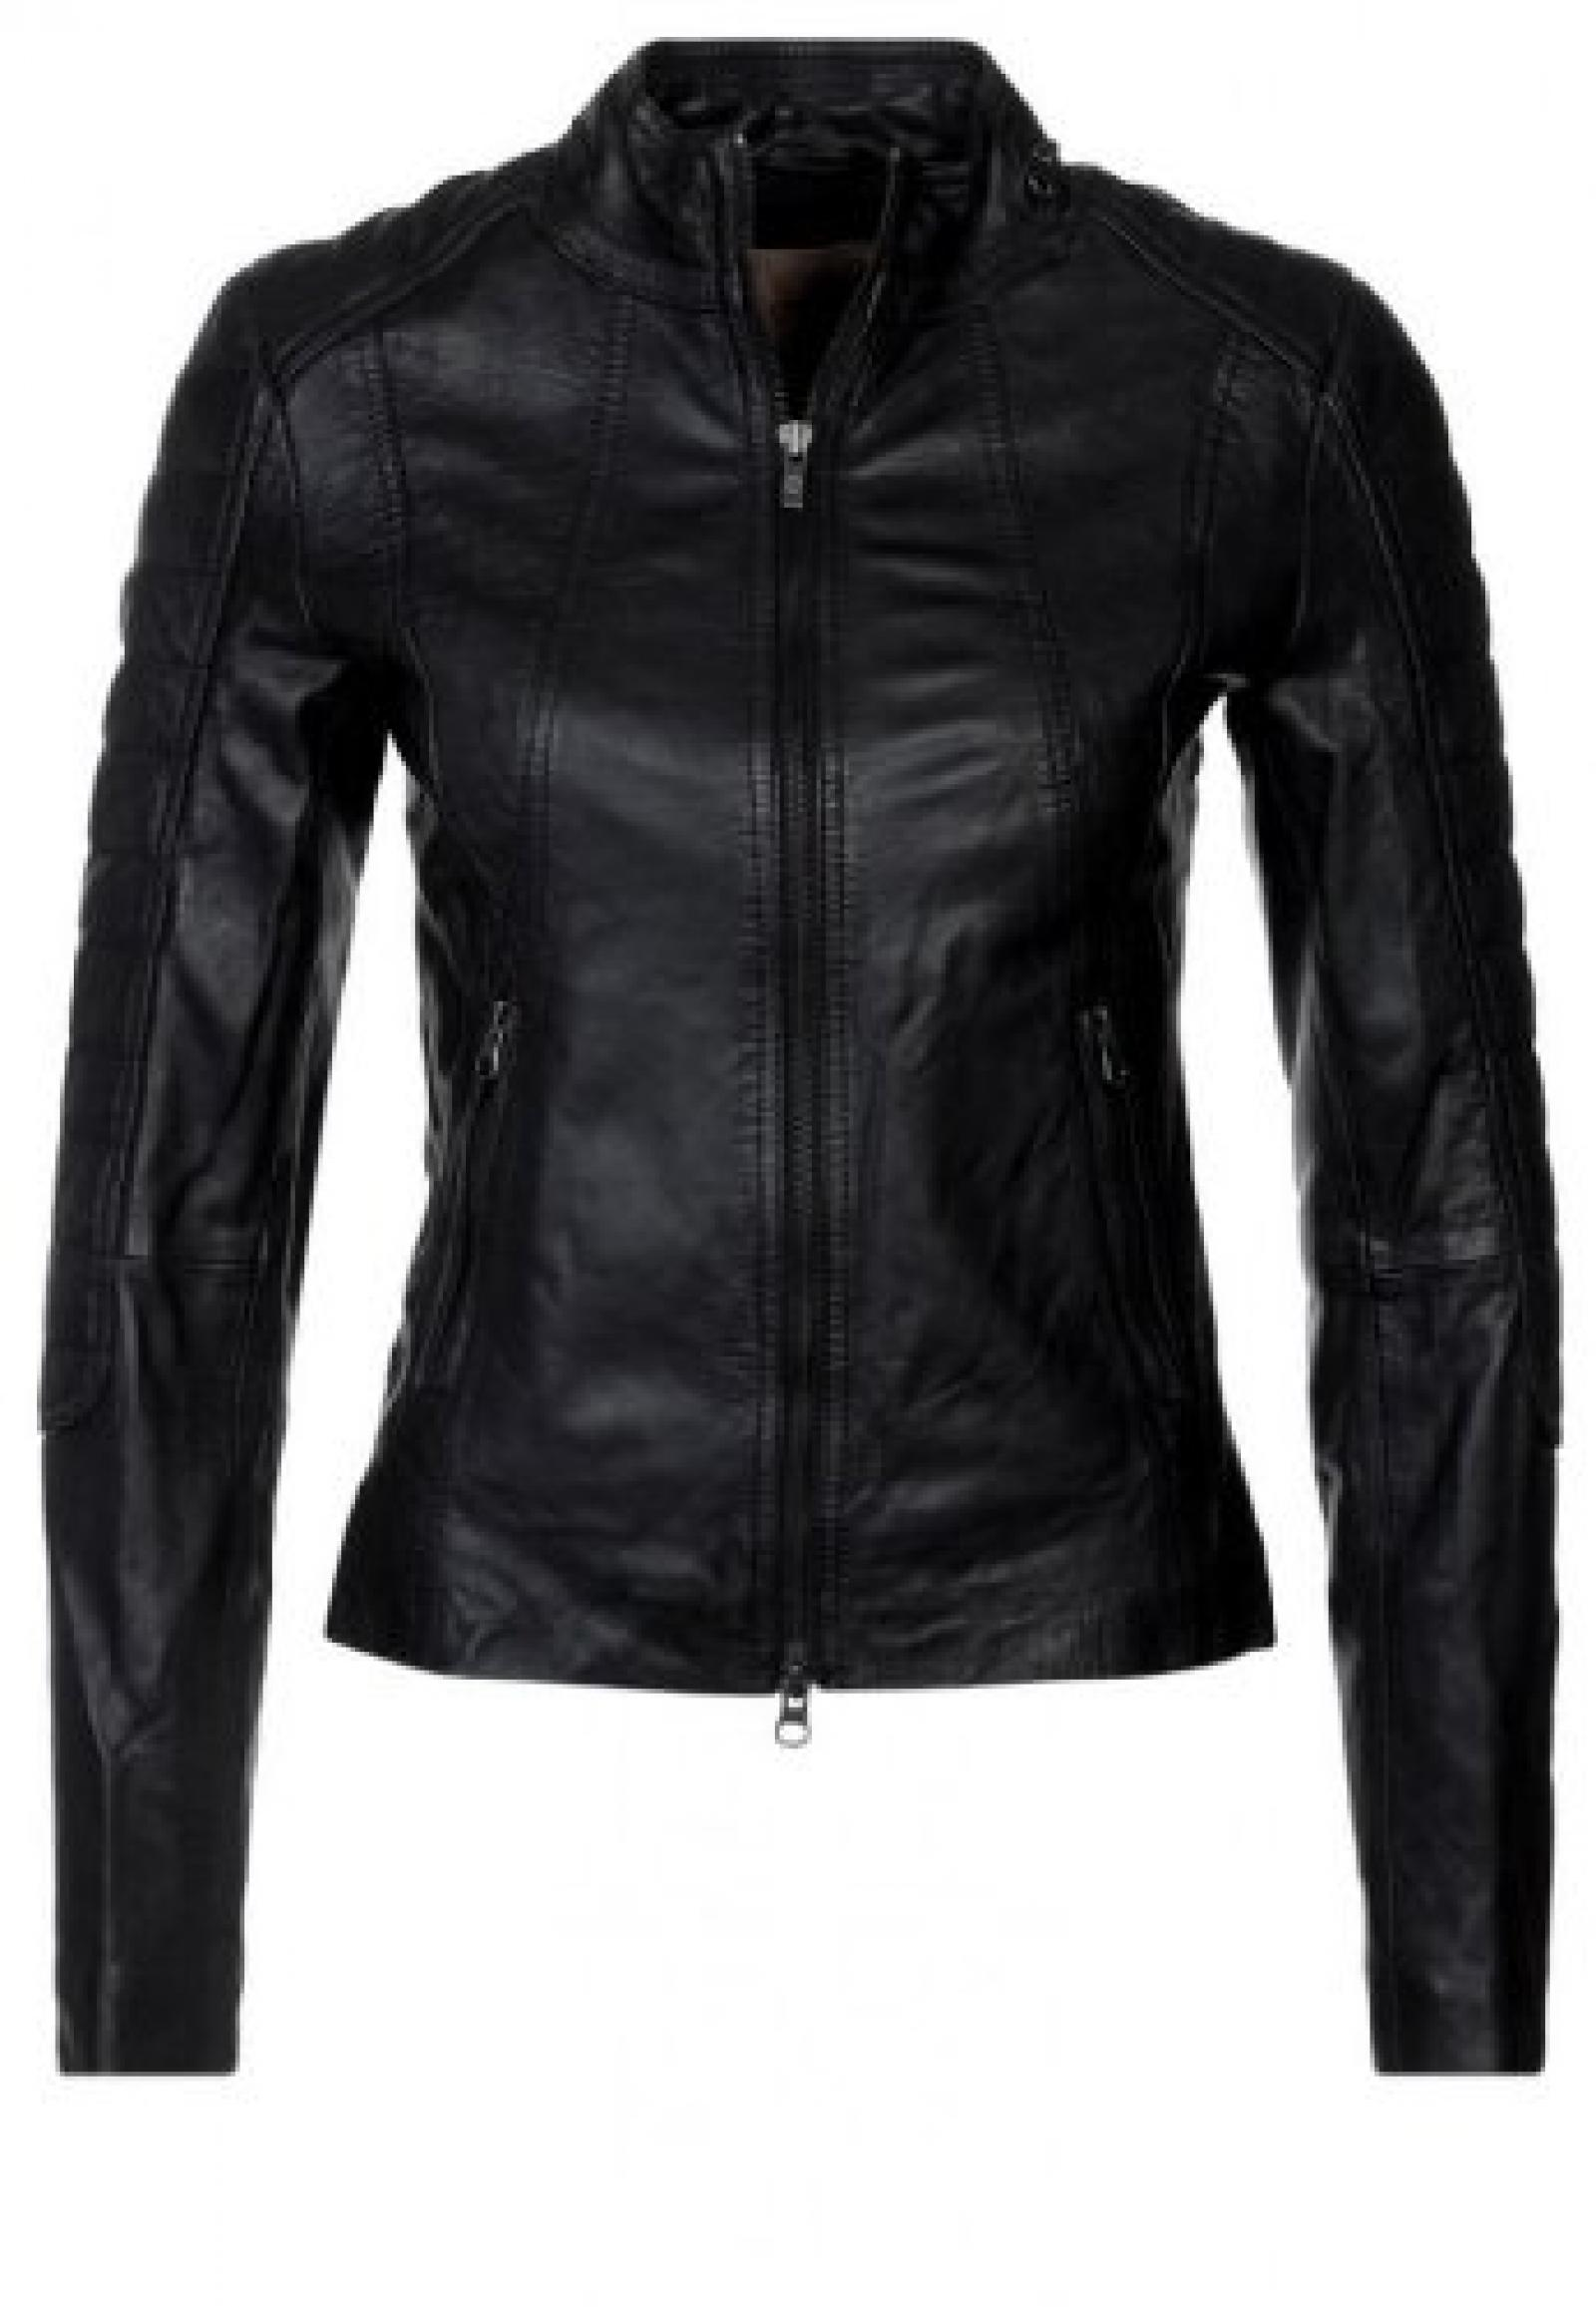 DashX schwarz Damen Lederjacke